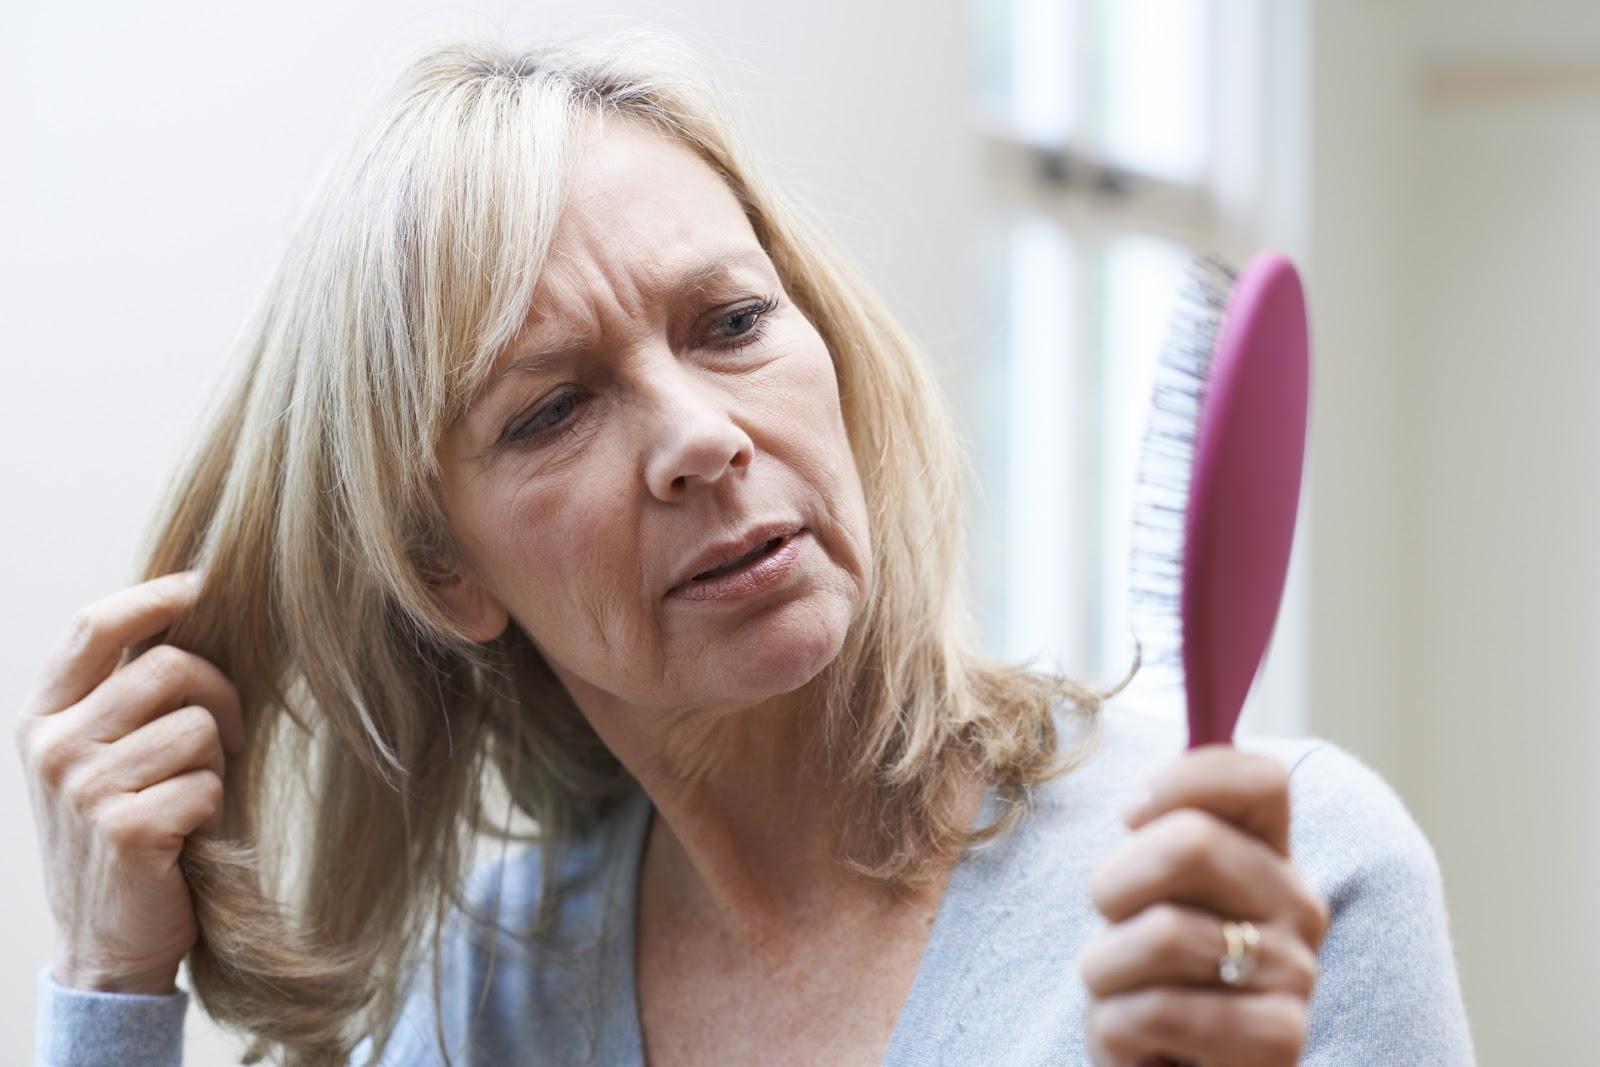 calvicie femenina durante la menopausia por DHI Costa Rica Soluciones